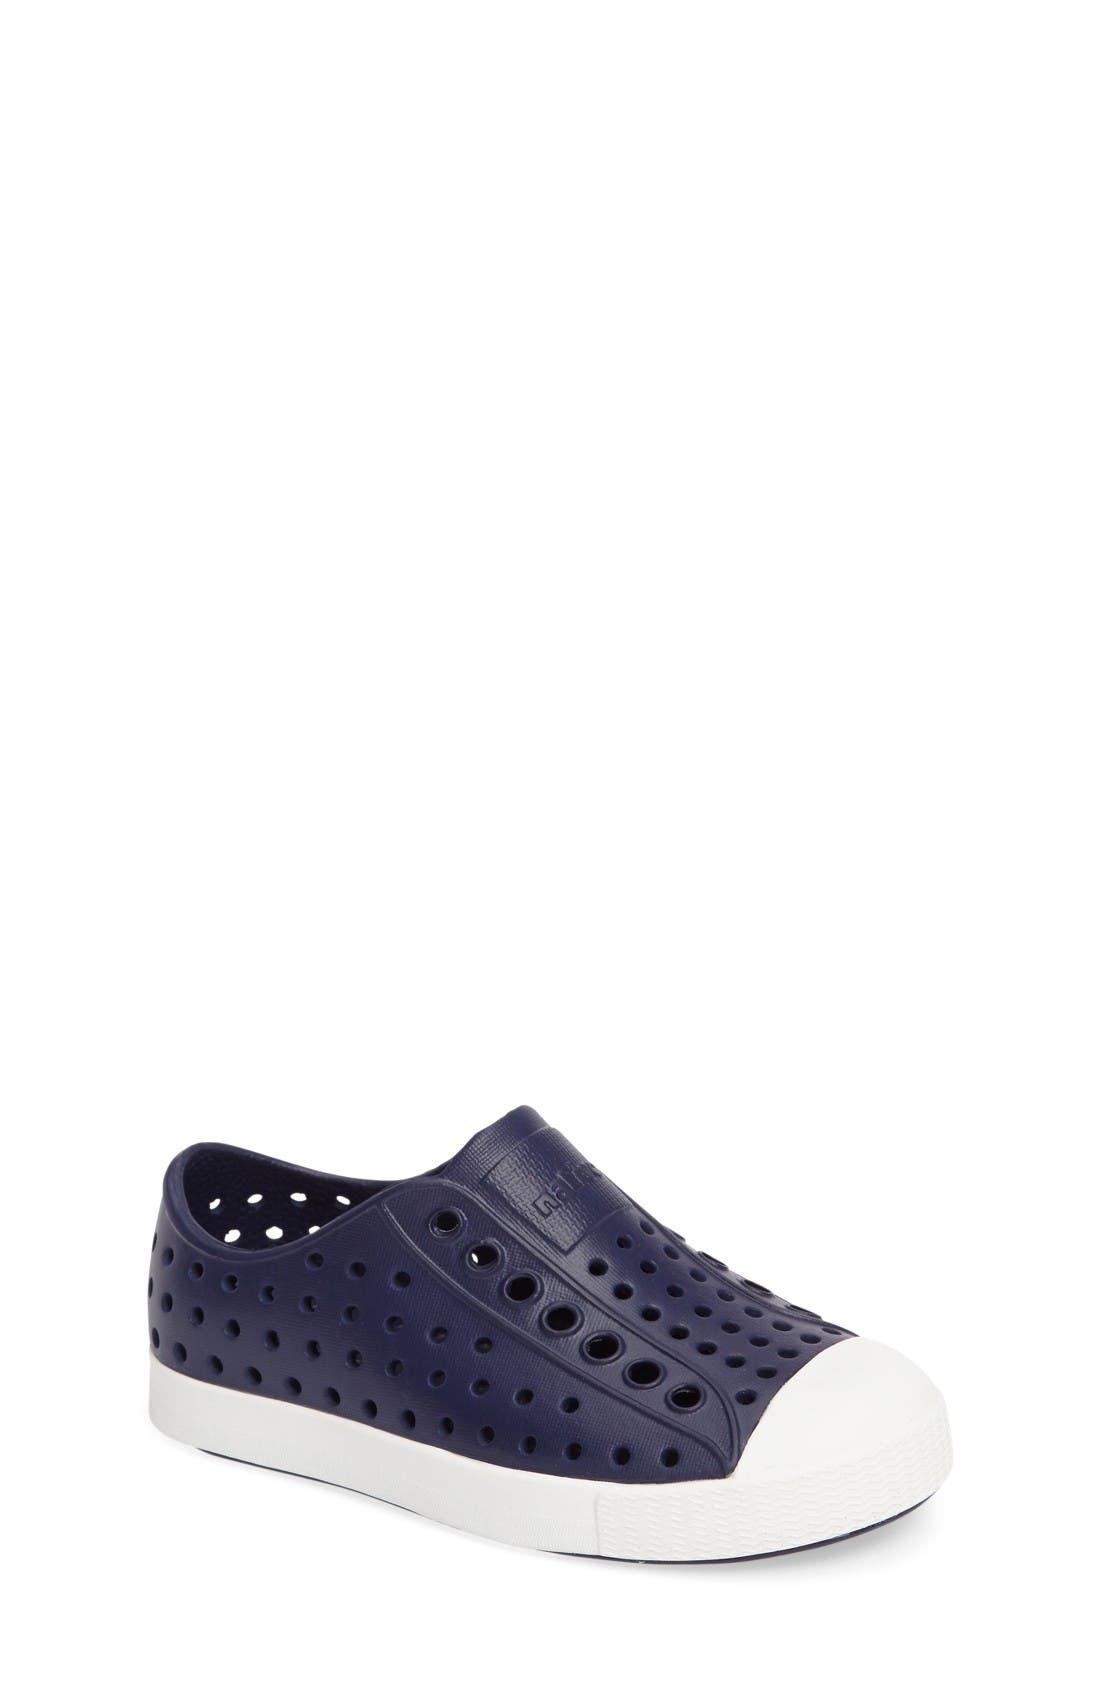 'Jefferson' Water Friendly Slip-On Sneaker,                         Main,                         color, Regatta Blue/ Shell White